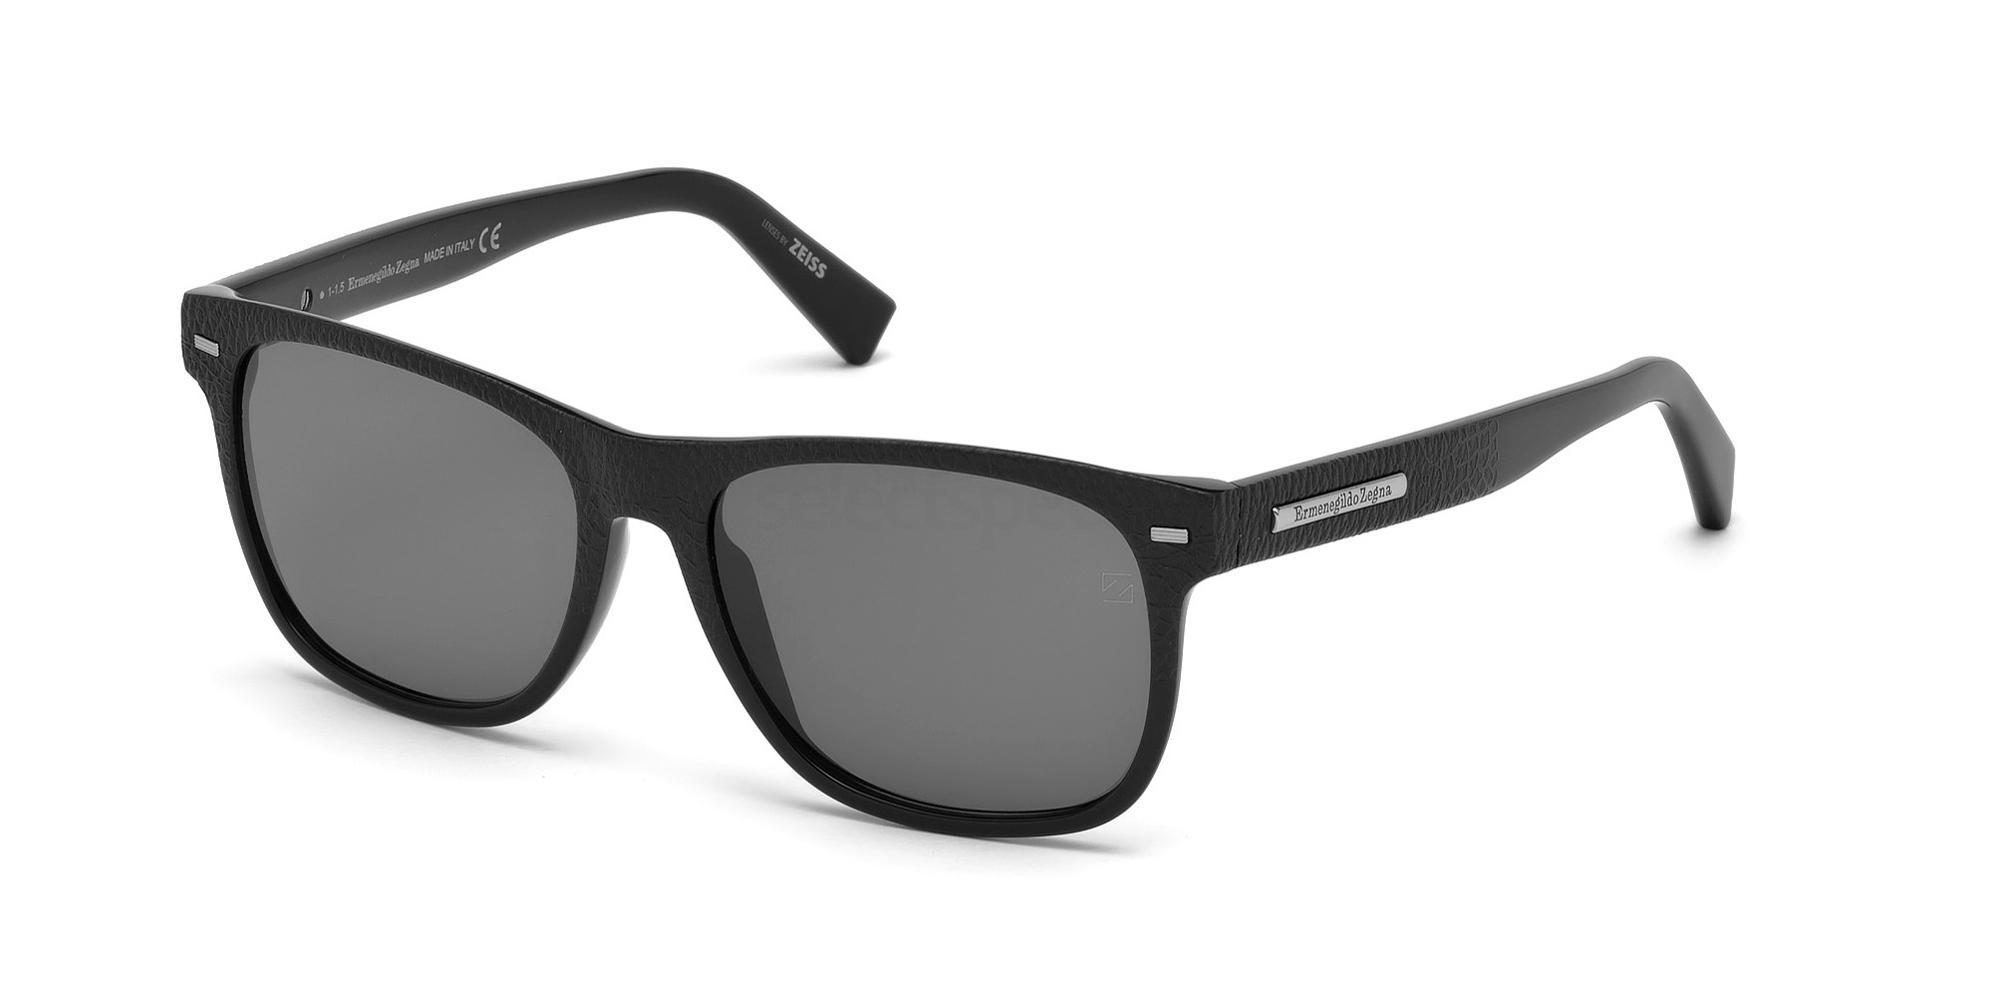 01A EZ0020 Sunglasses, Ermenegildo Zegna